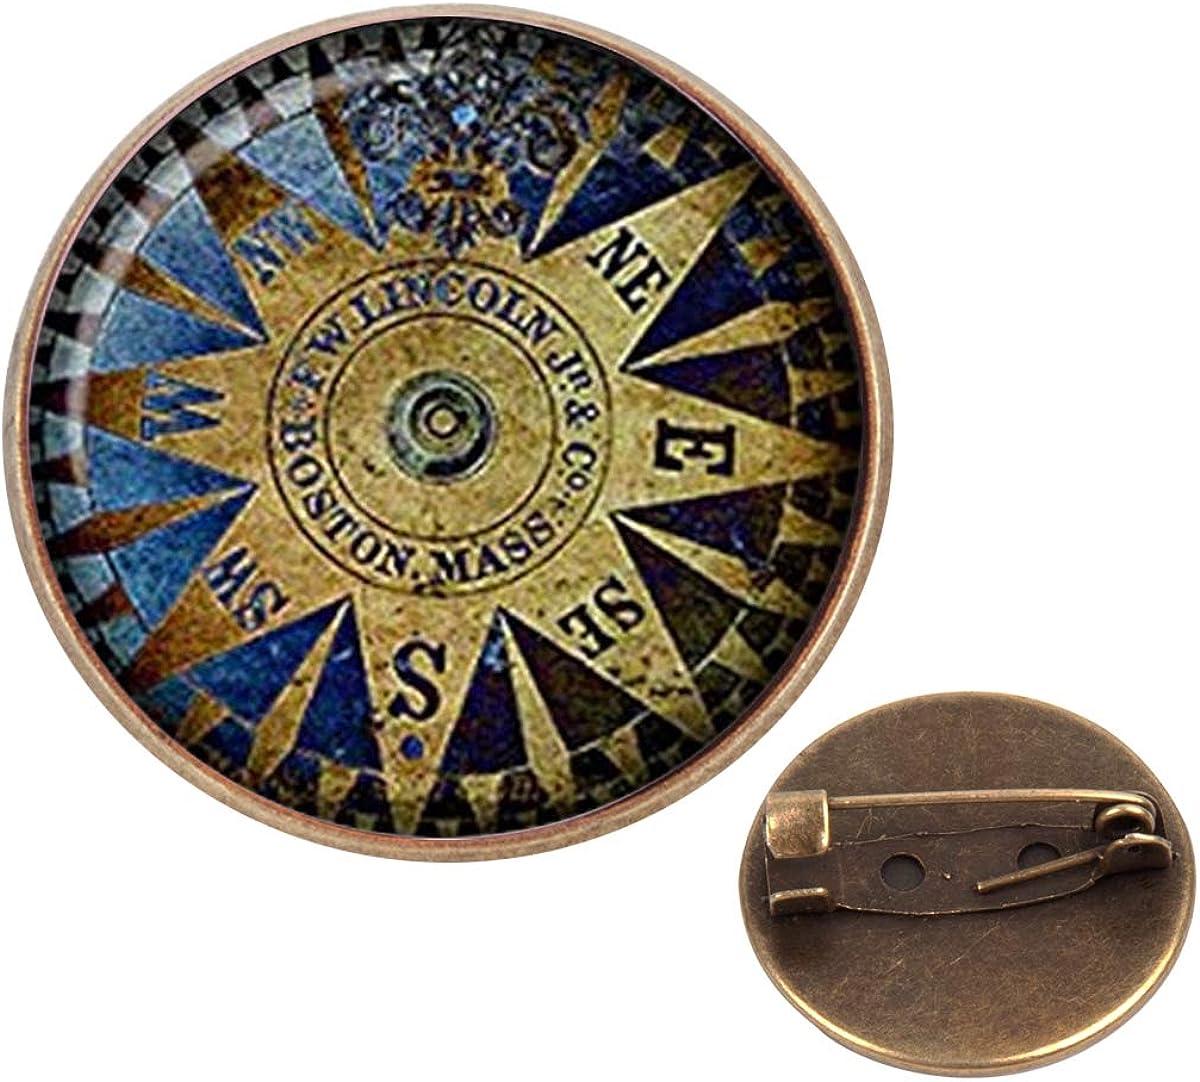 Pinback Buttons Badges Pins Vintage Compass Wind Rose Lapel Pin Brooch Clip Trendy Accessory Jacket T-Shirt Bag Hat Shoe